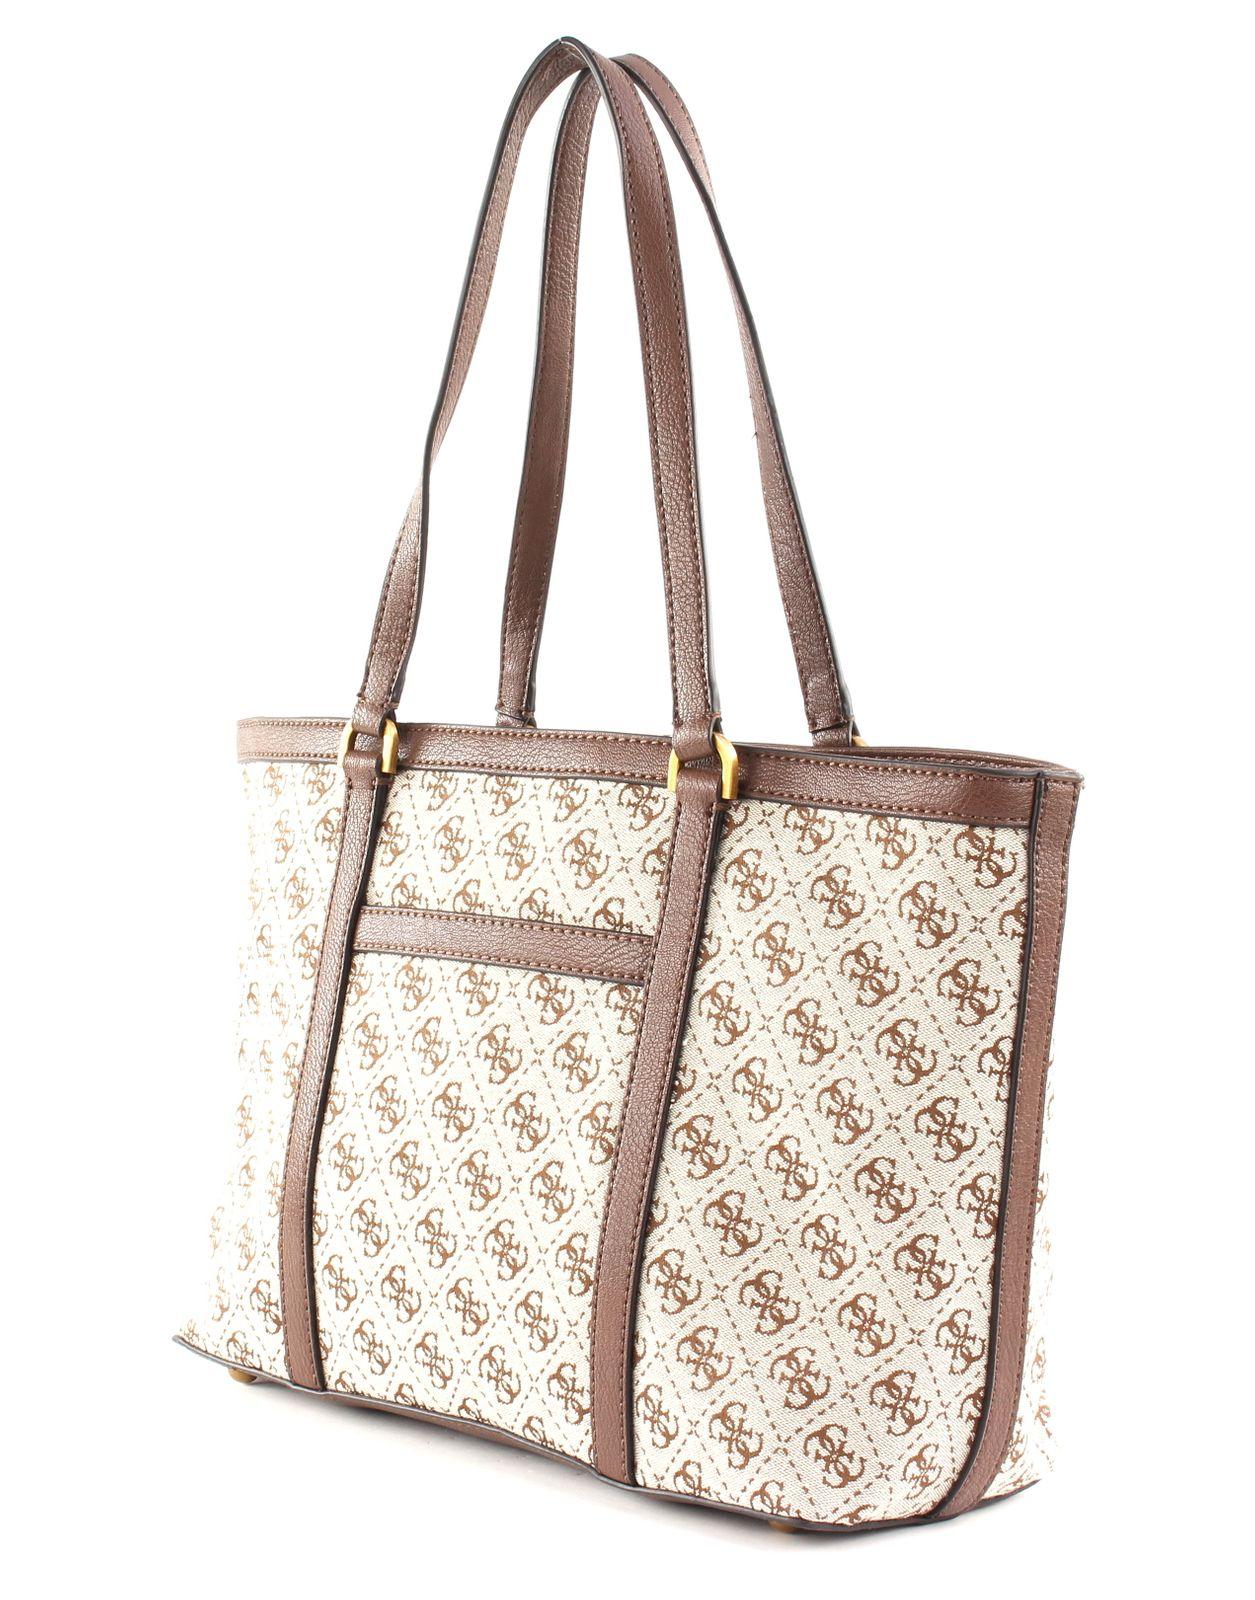 Borsa Guess Vintage Shopper Sb730424 Brown | Acquisti Online